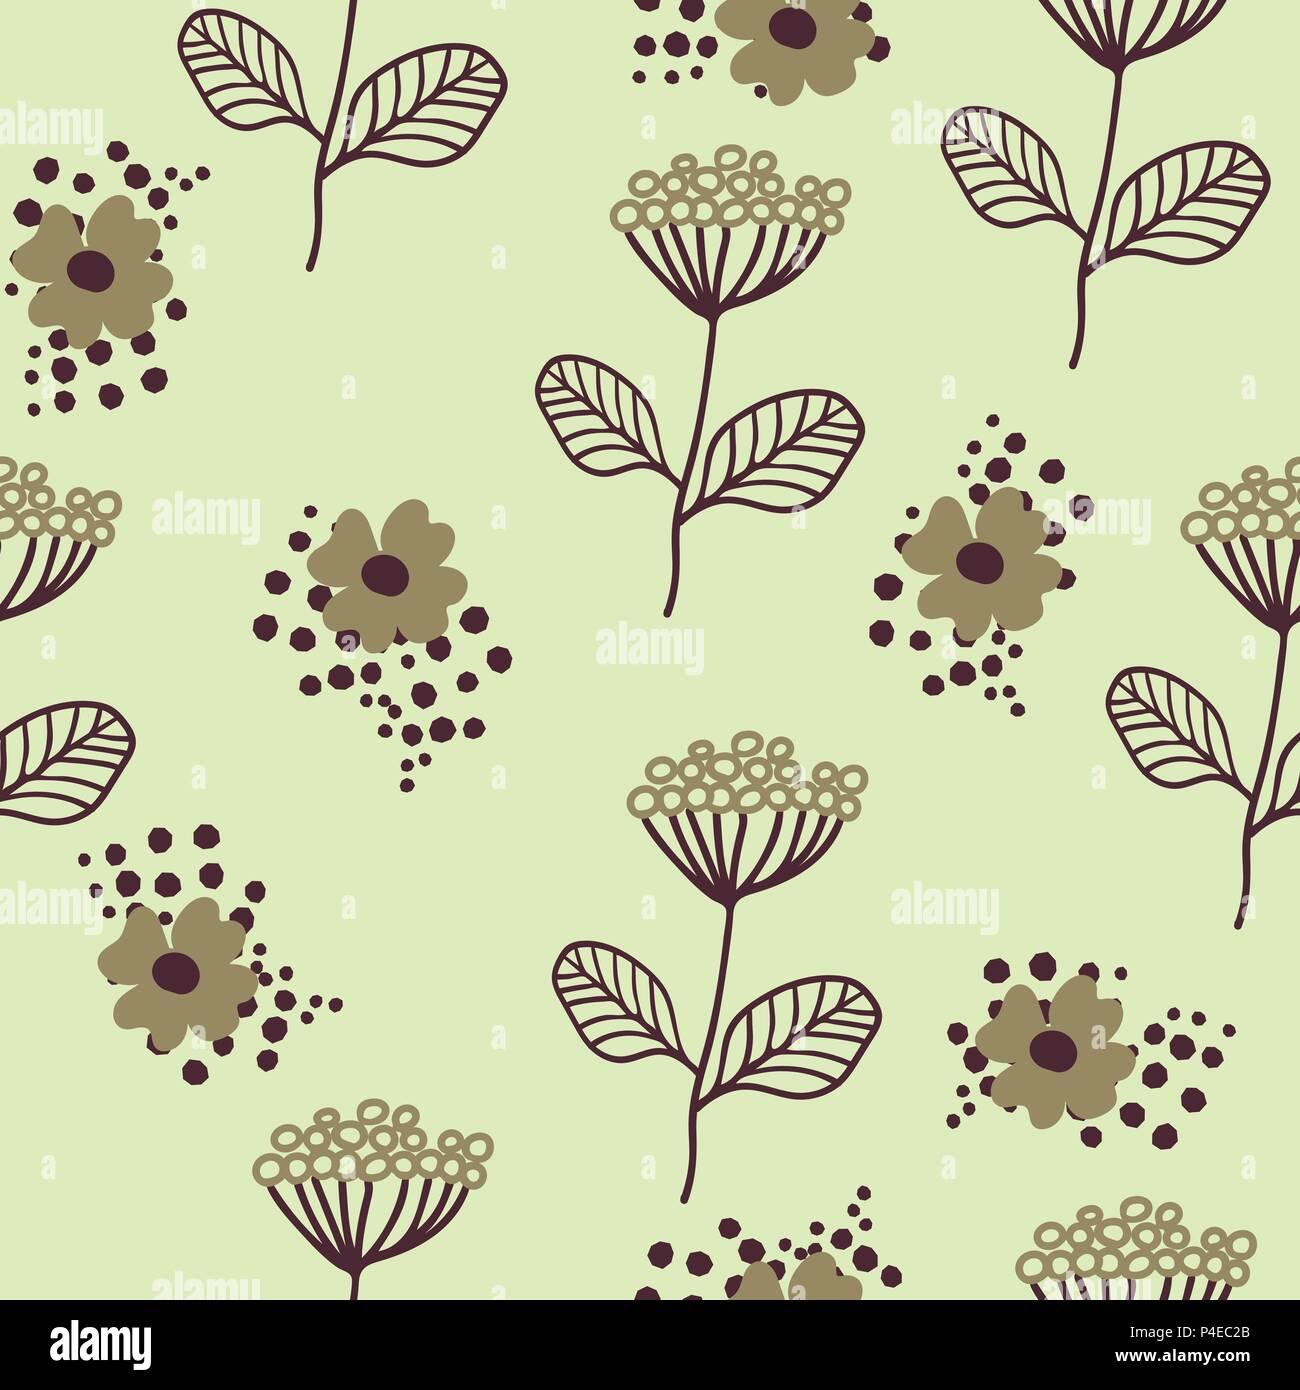 Nahtlose Muster Im Skandinavischen Stil Florar Muster Fur Das